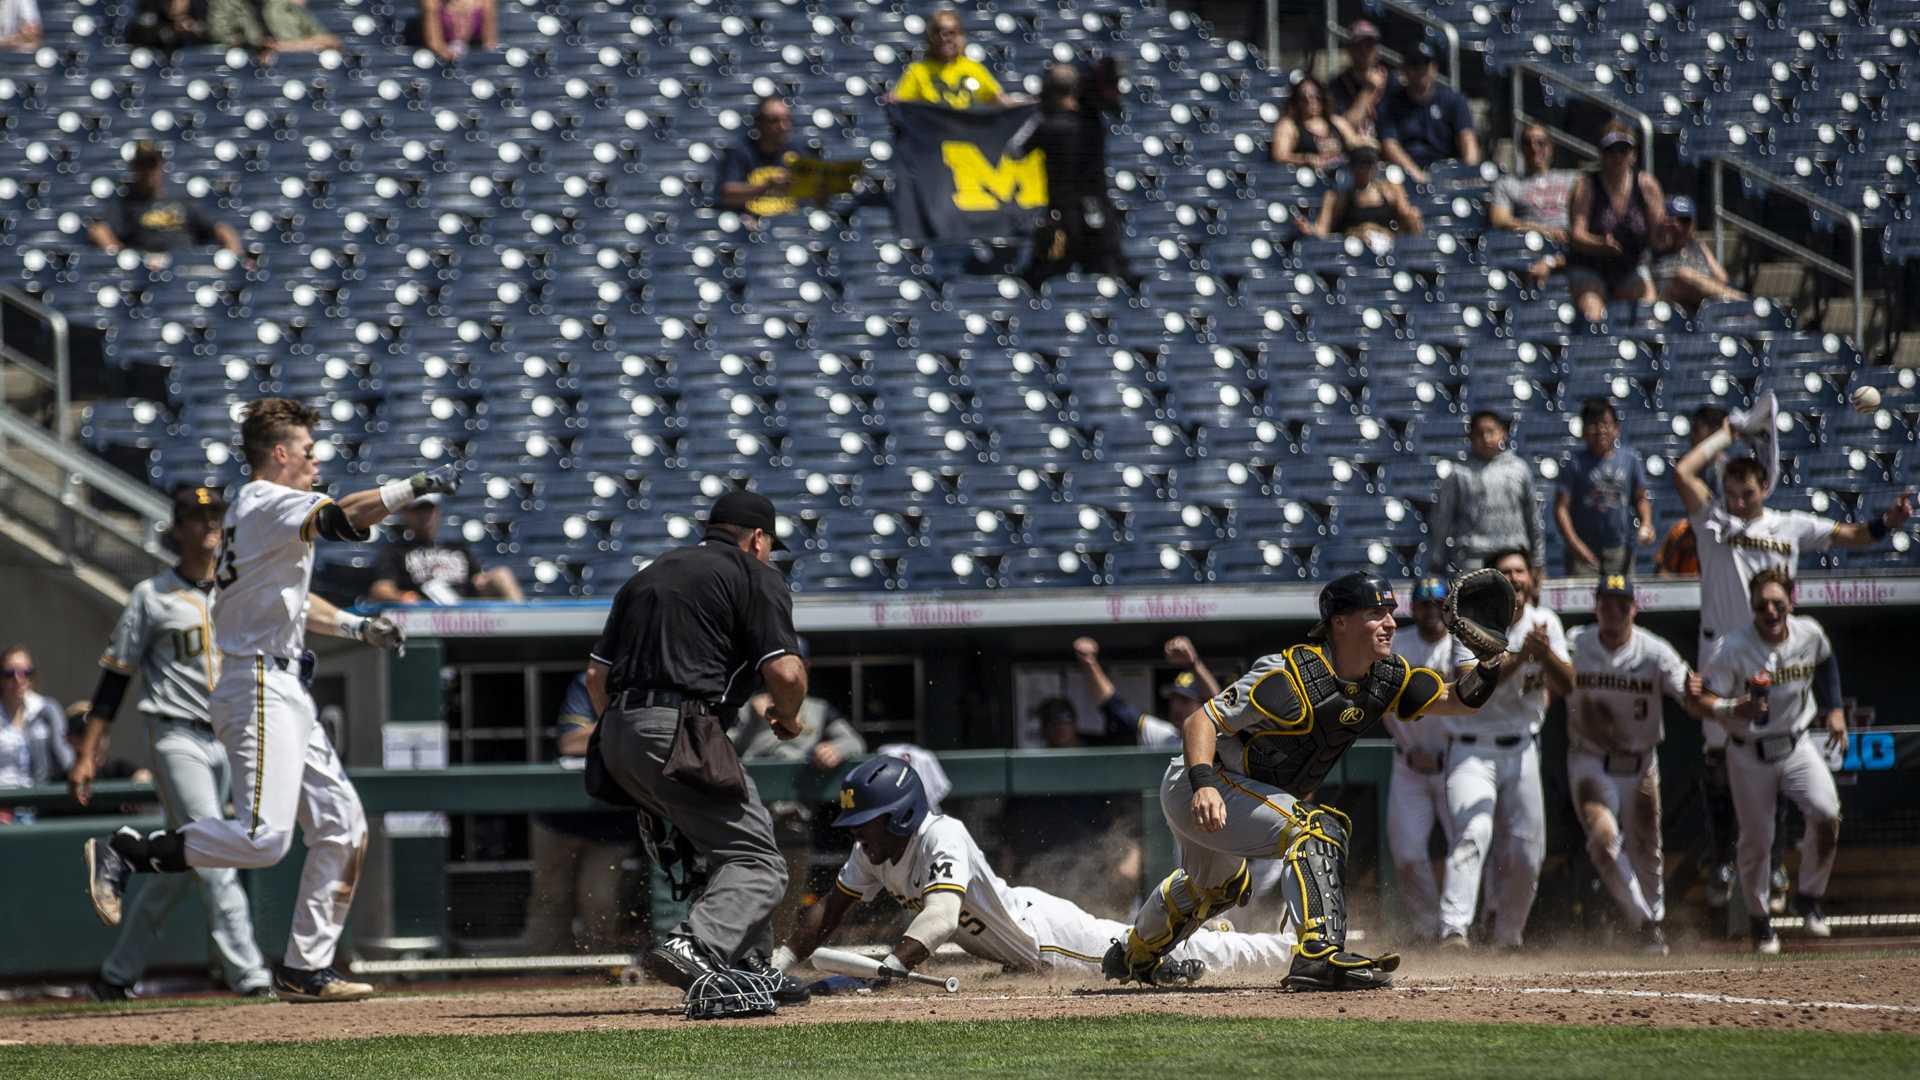 Iowa loses to Michigan in Big Ten Tournament opener